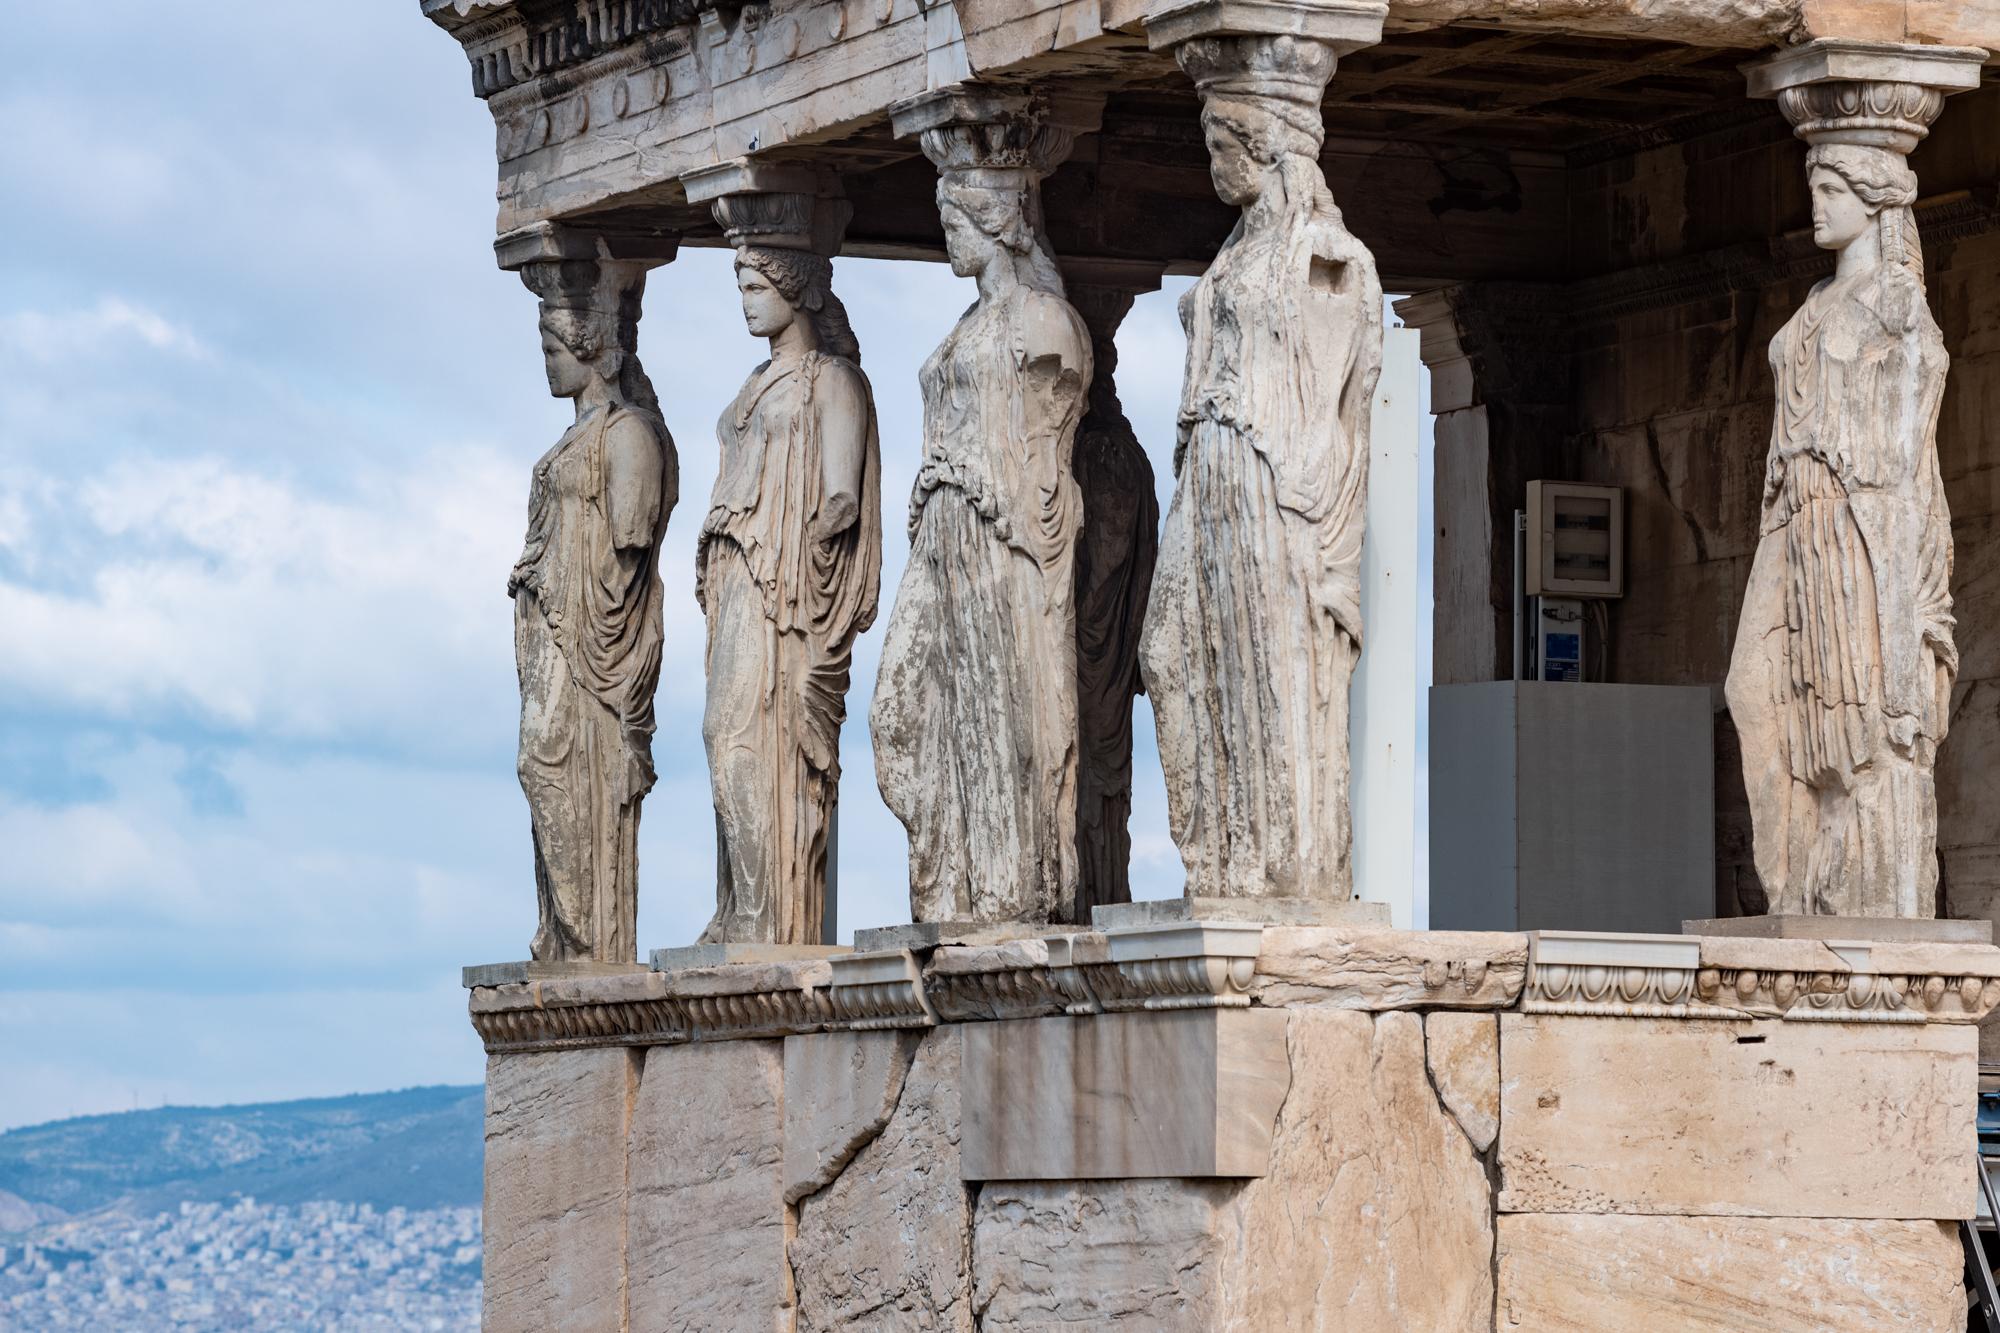 The maiden columns of the Erechtheum